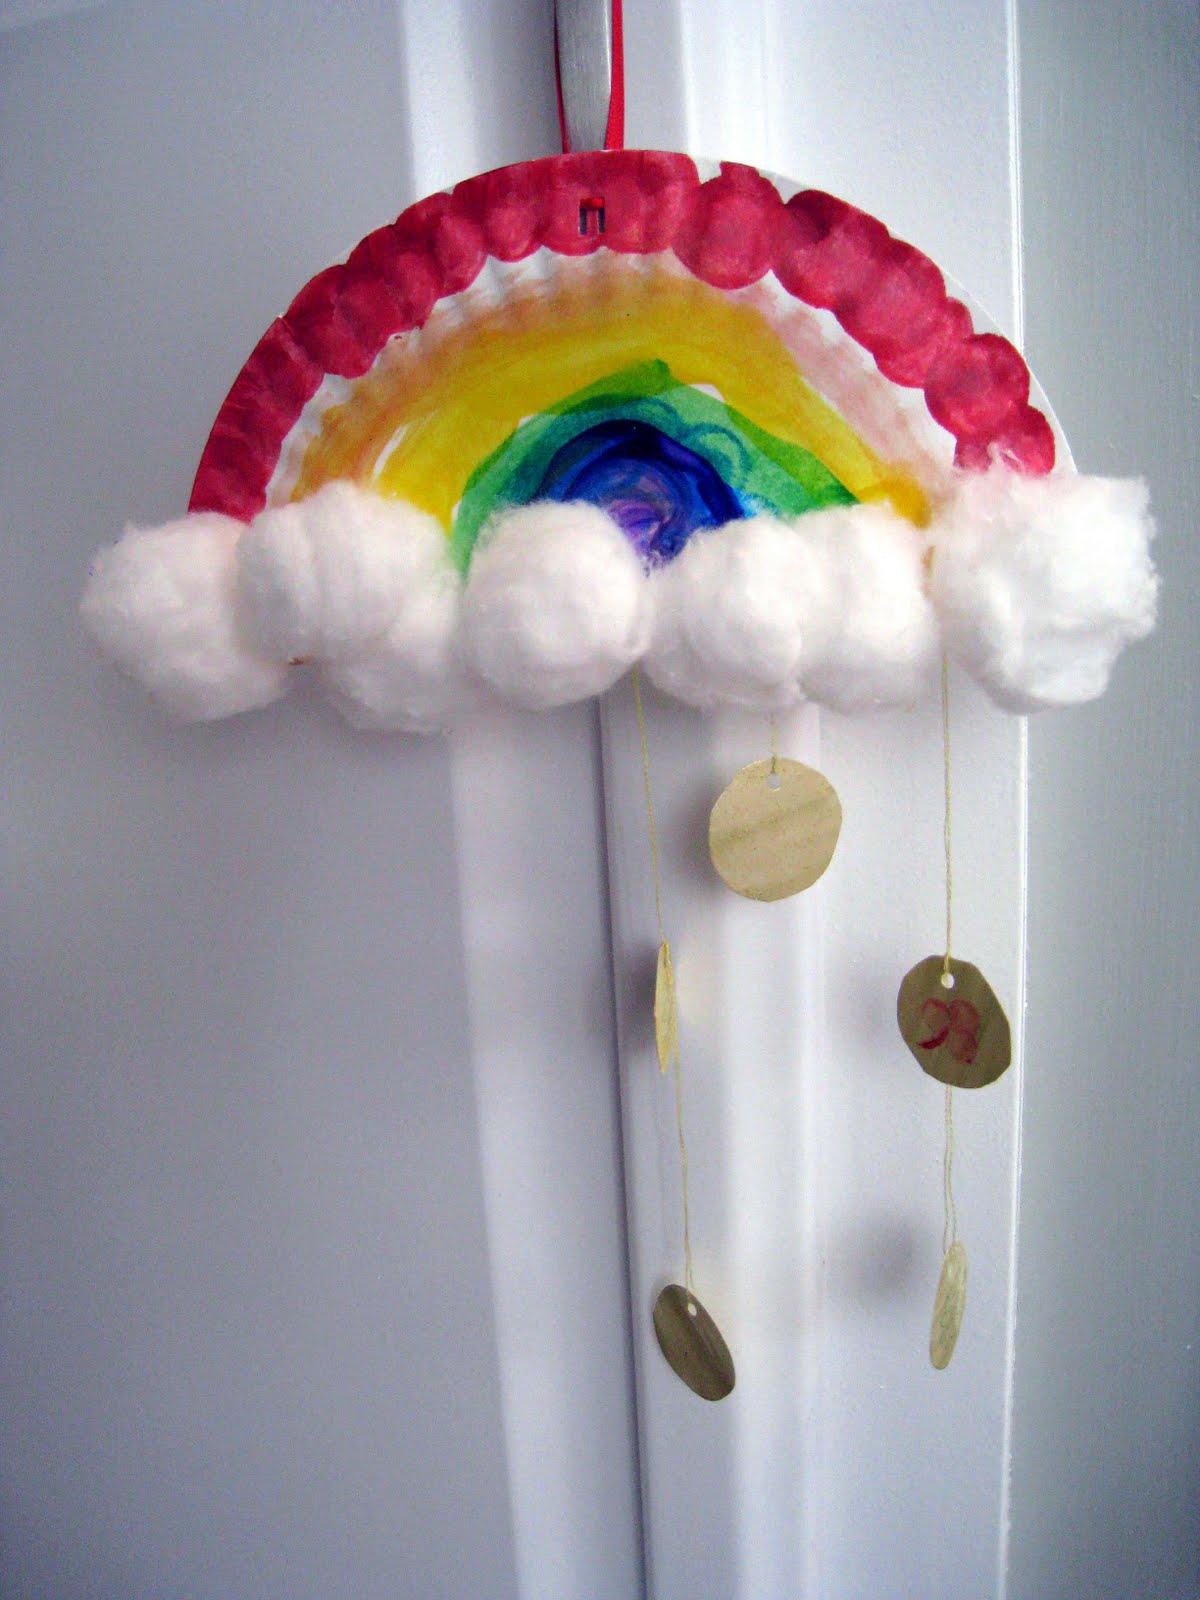 More Rainbow Magic